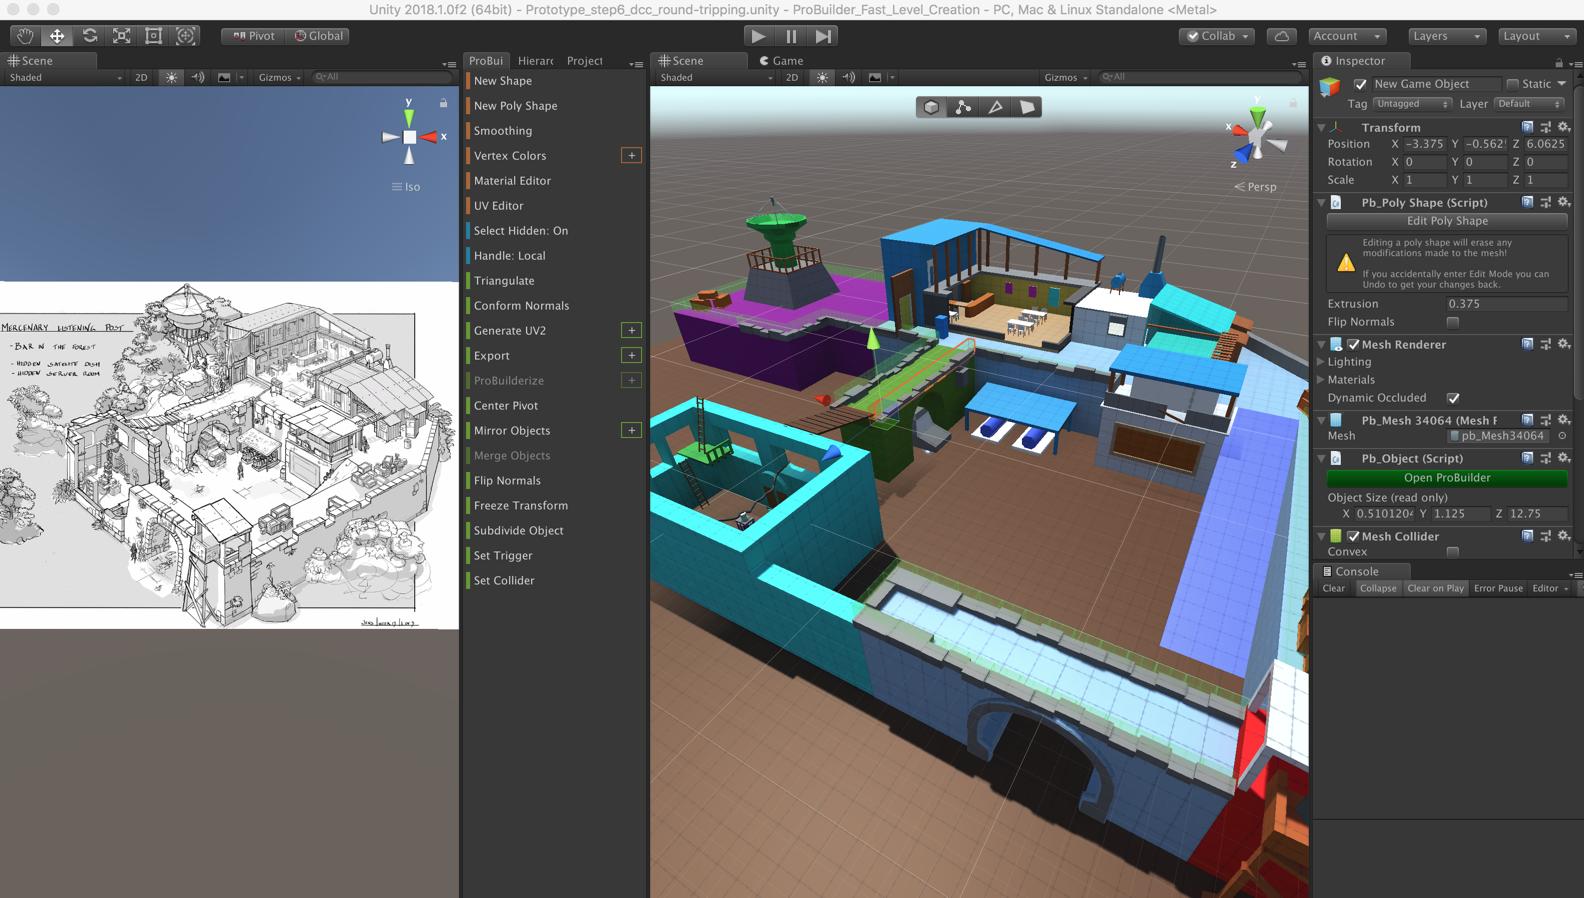 Unity引擎ProBuilder快速关卡建模实践+ProBuilder建关卡竞赛